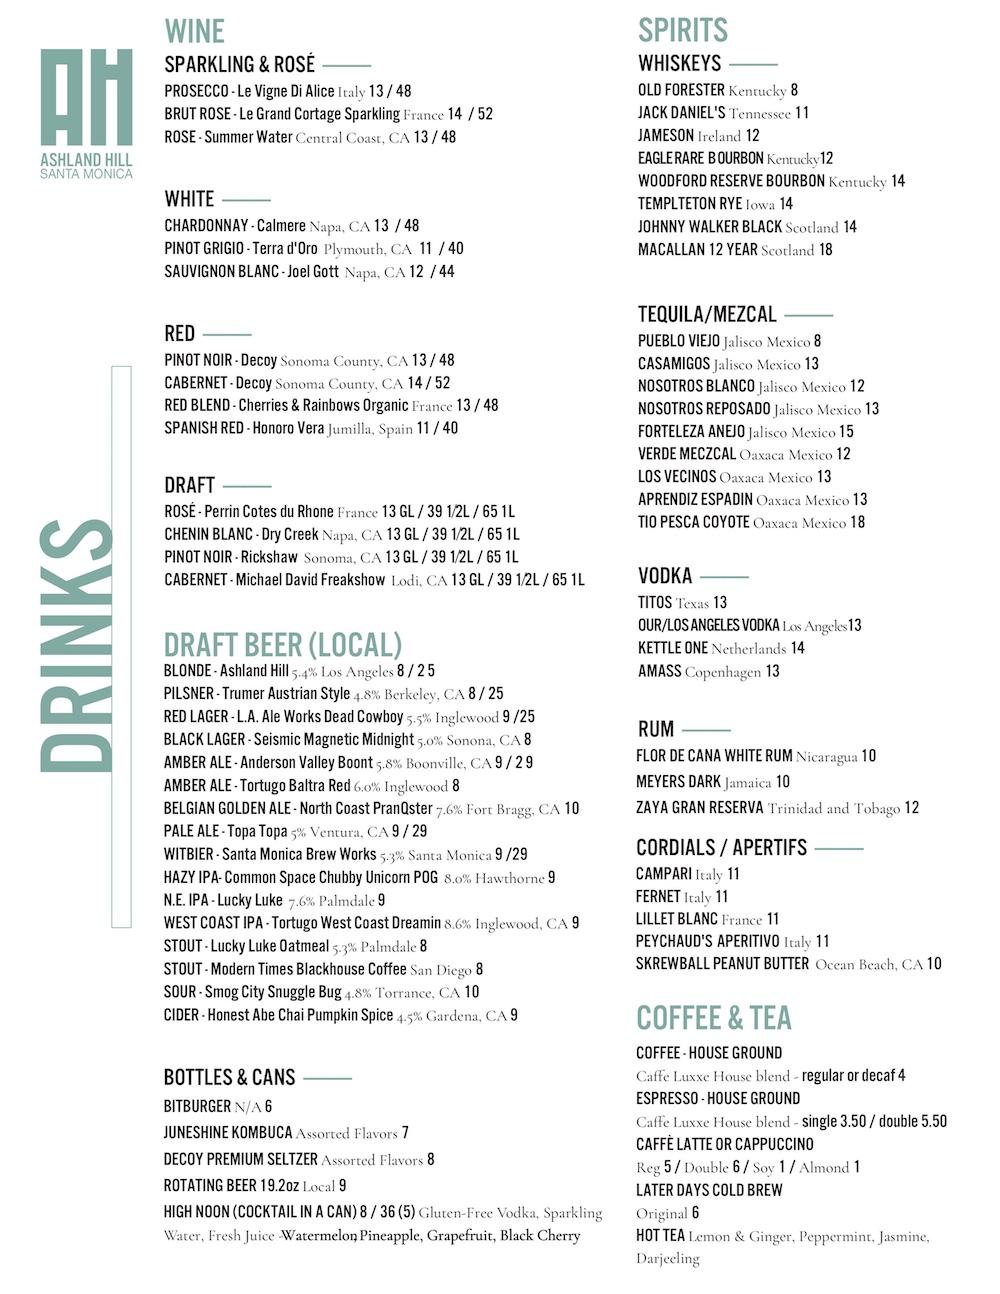 Ashland Hill Drinks Menu